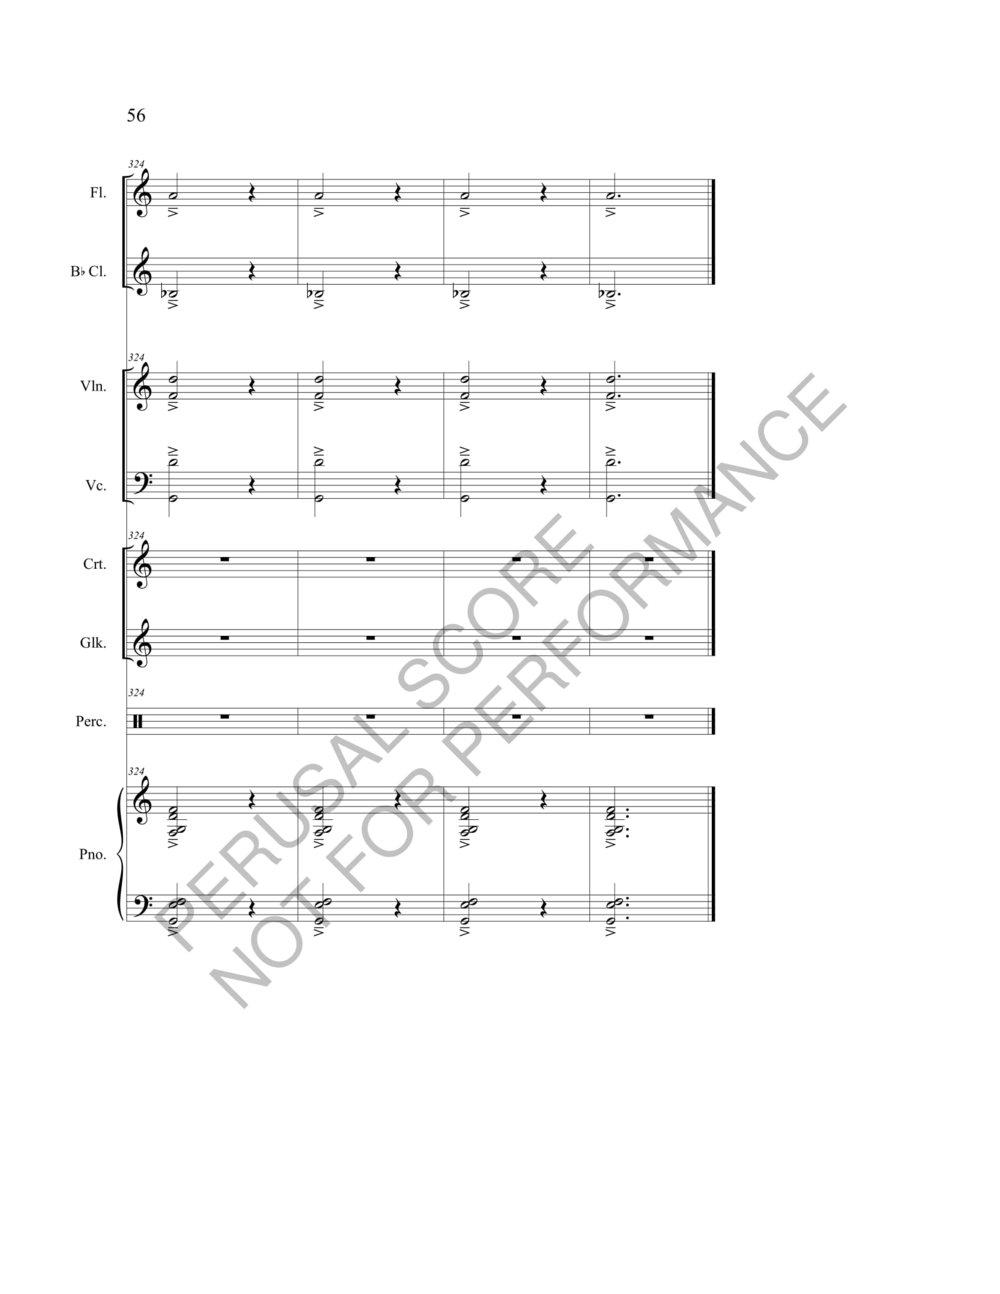 Boyd Terra Liberi Score-watermark-62.jpg